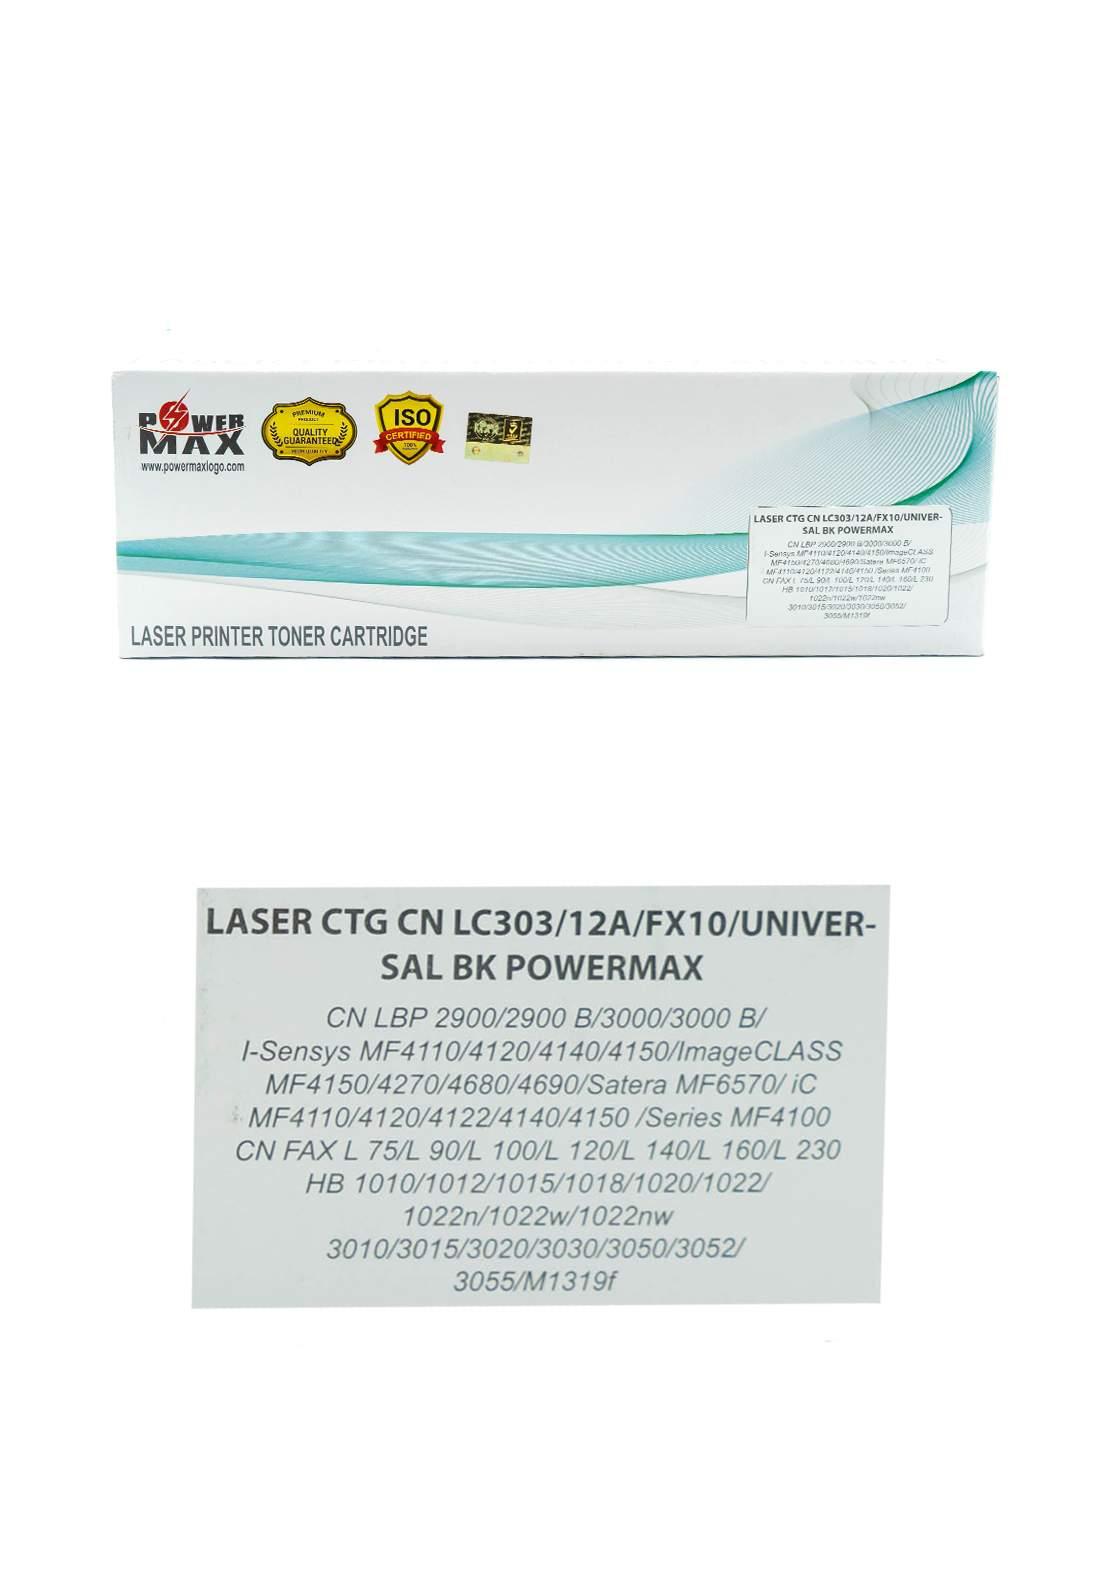 Power Max LC 303 / 12A / FX10 Laser Printer Toner Cartridge - Black خرطوشة حبر